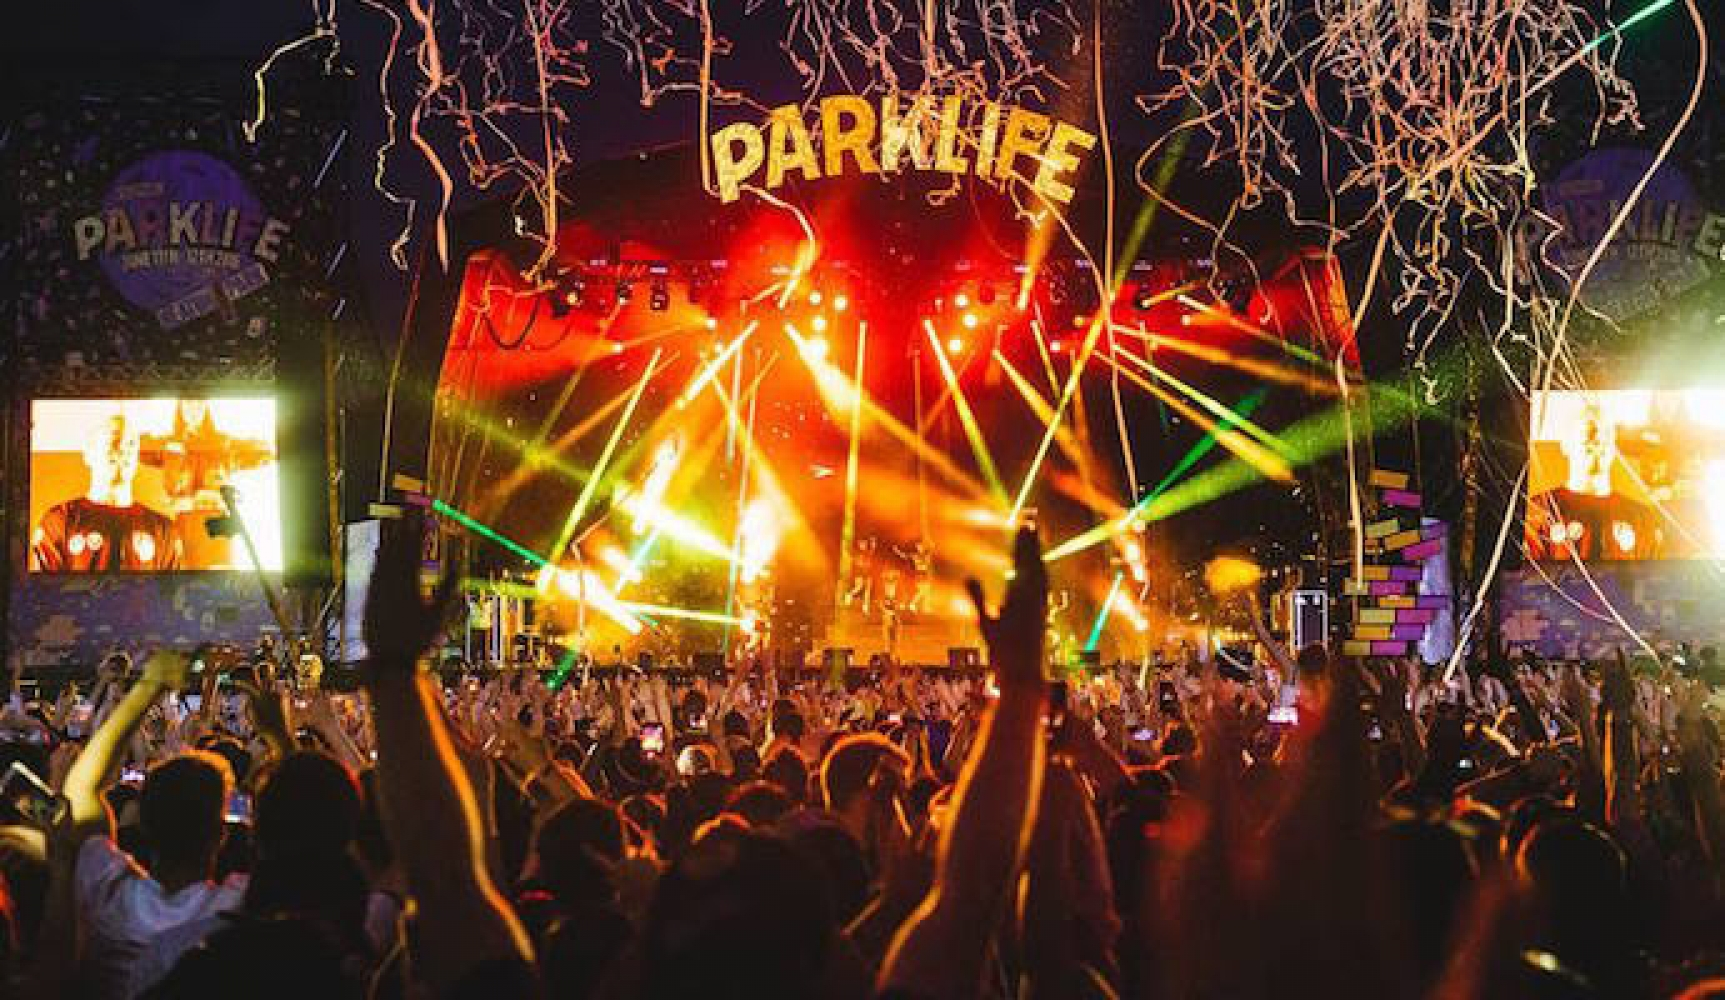 170317 Parklife Crowd